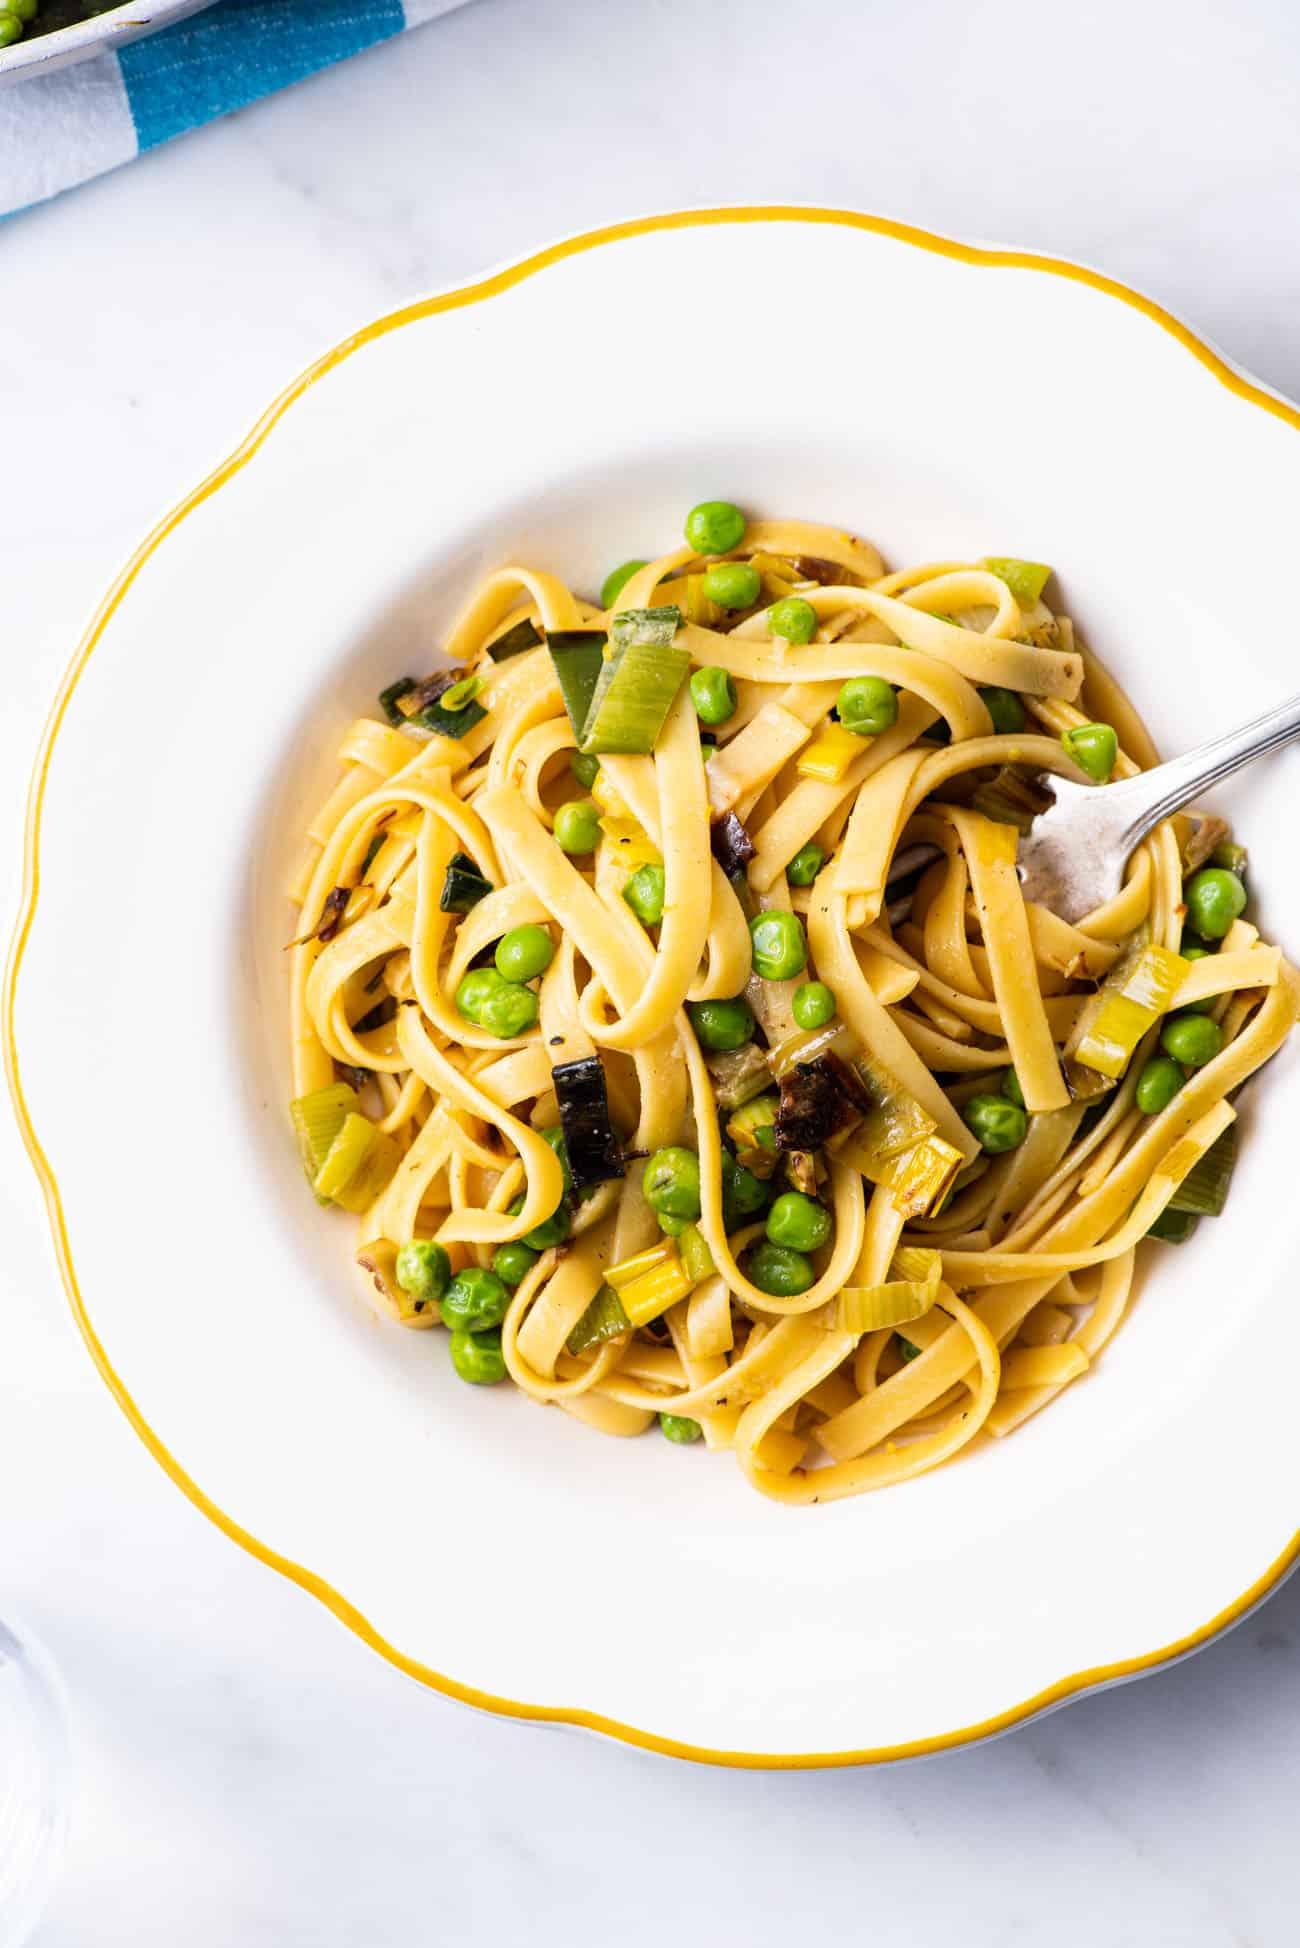 Vegan leek pasta with peas in a vintage scalloped bowl